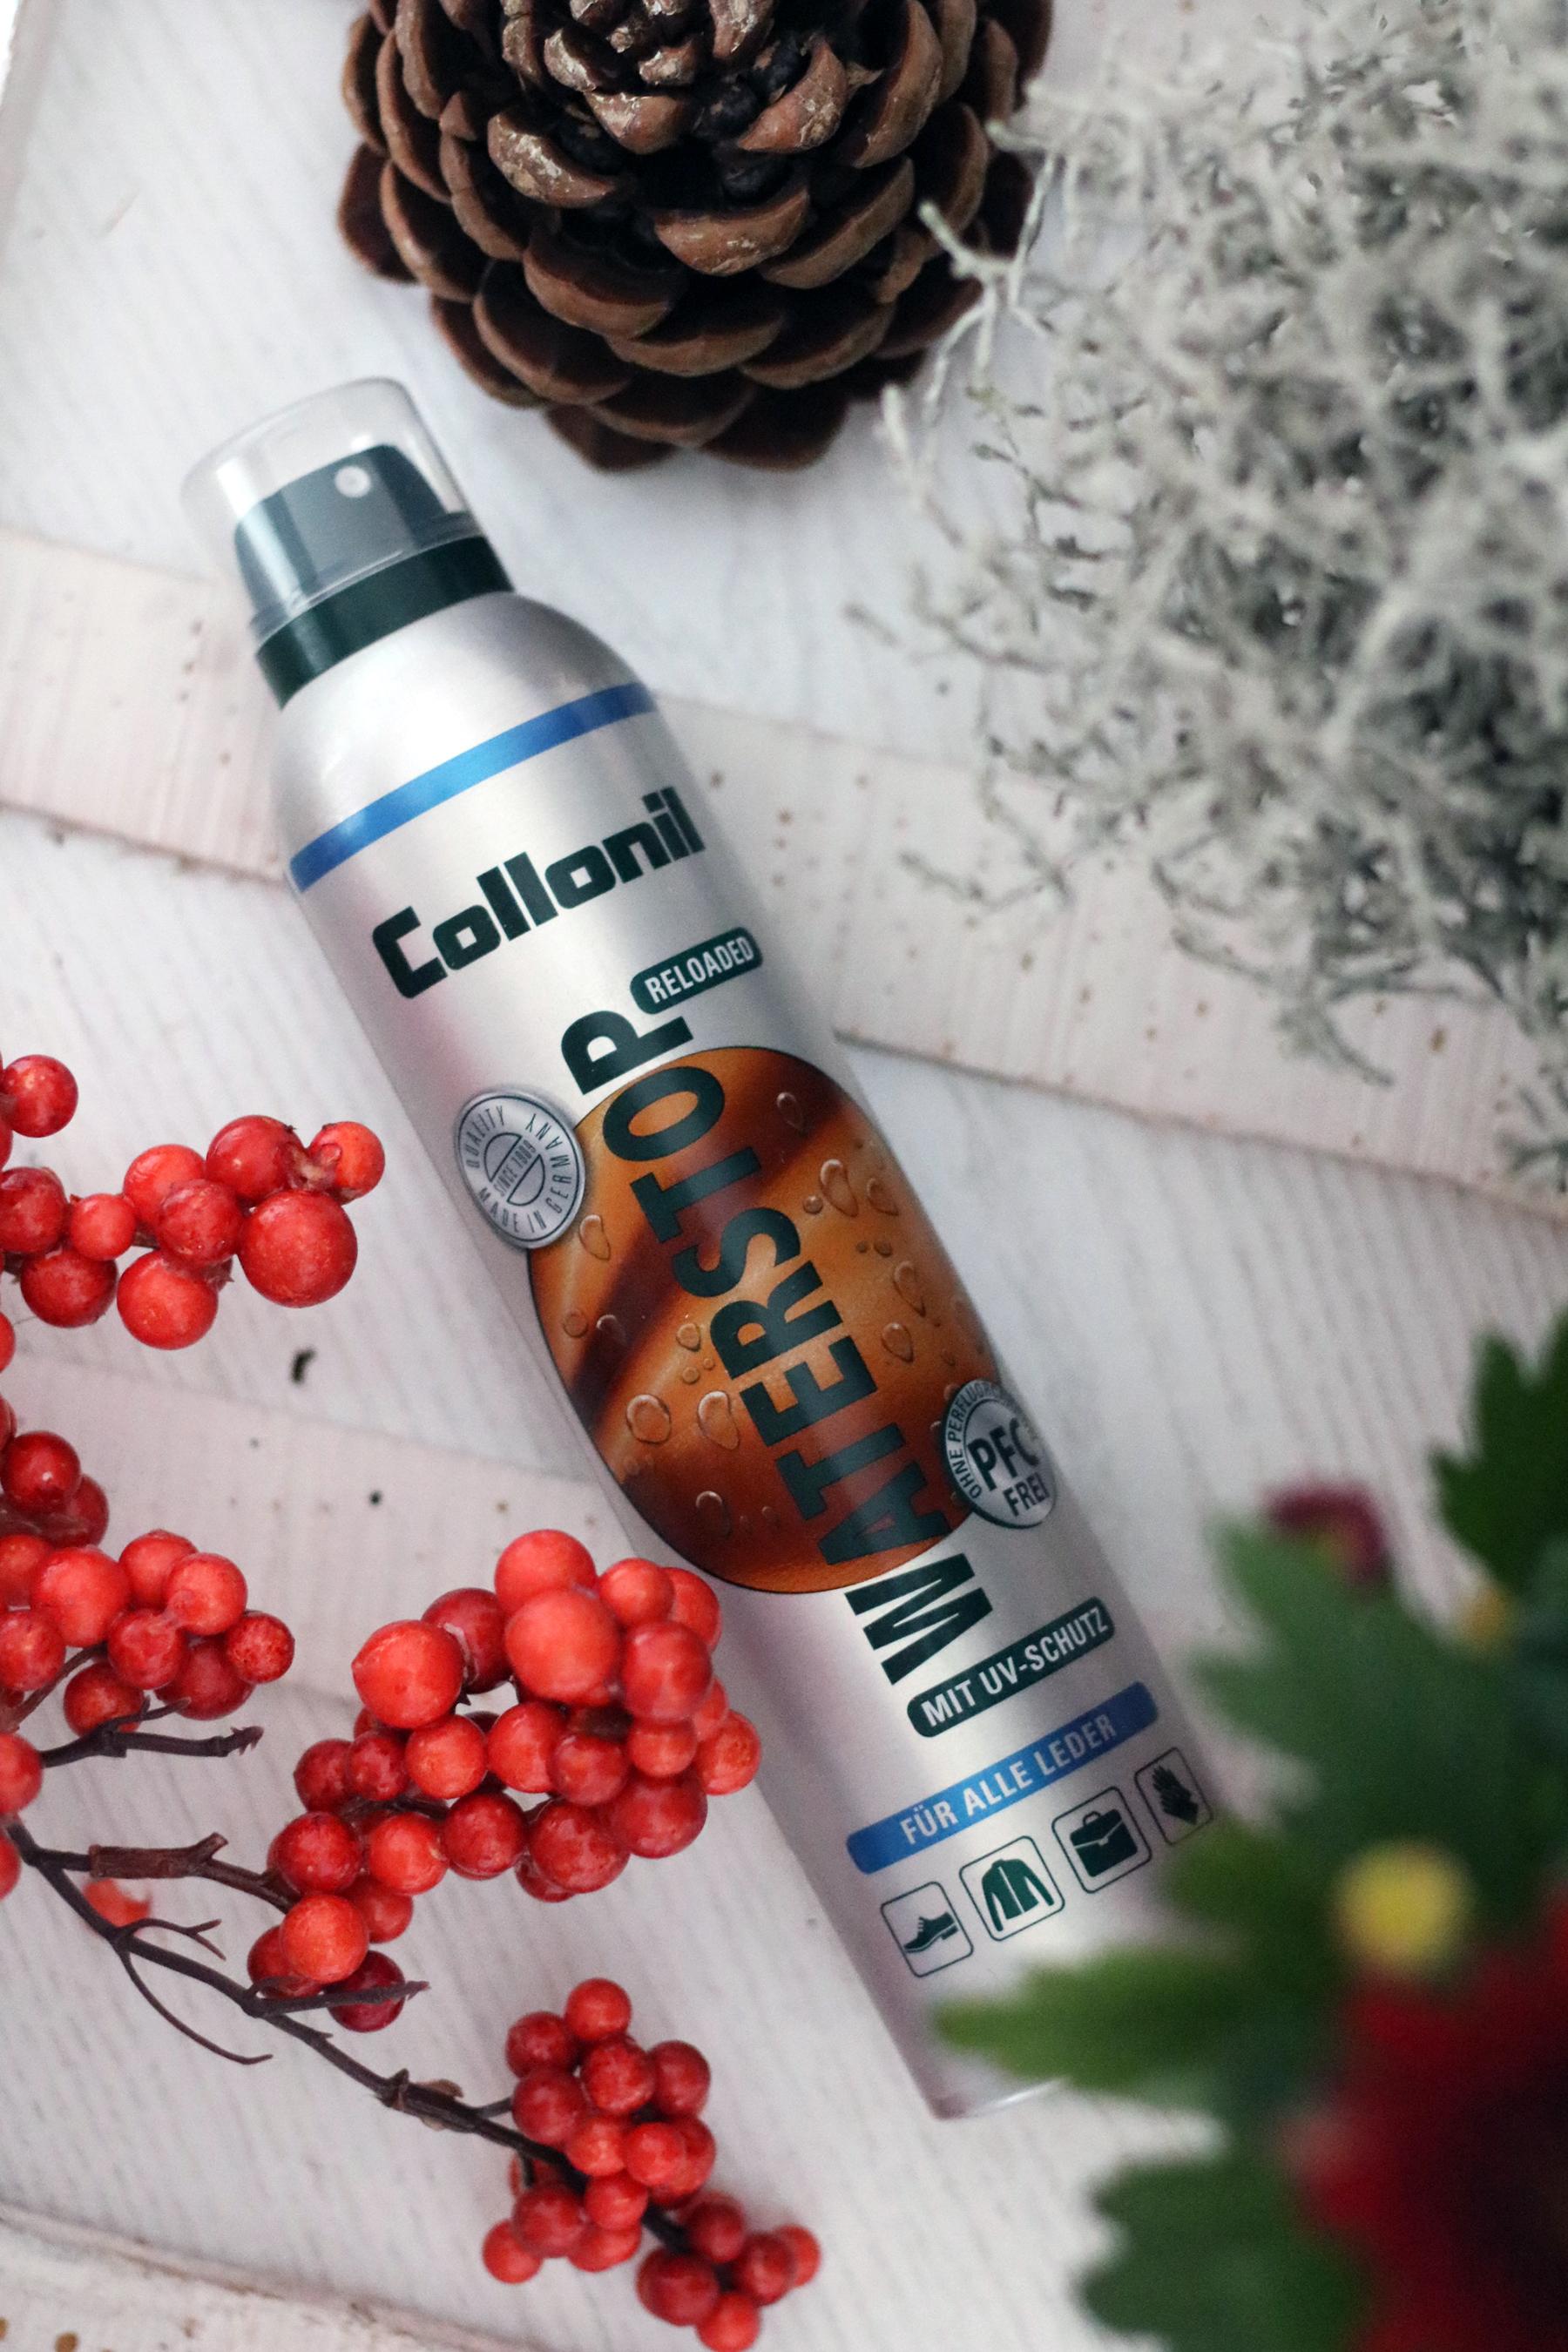 collonil-schuhe-boots-herbst-winter-liebste-modeblog-pflege1